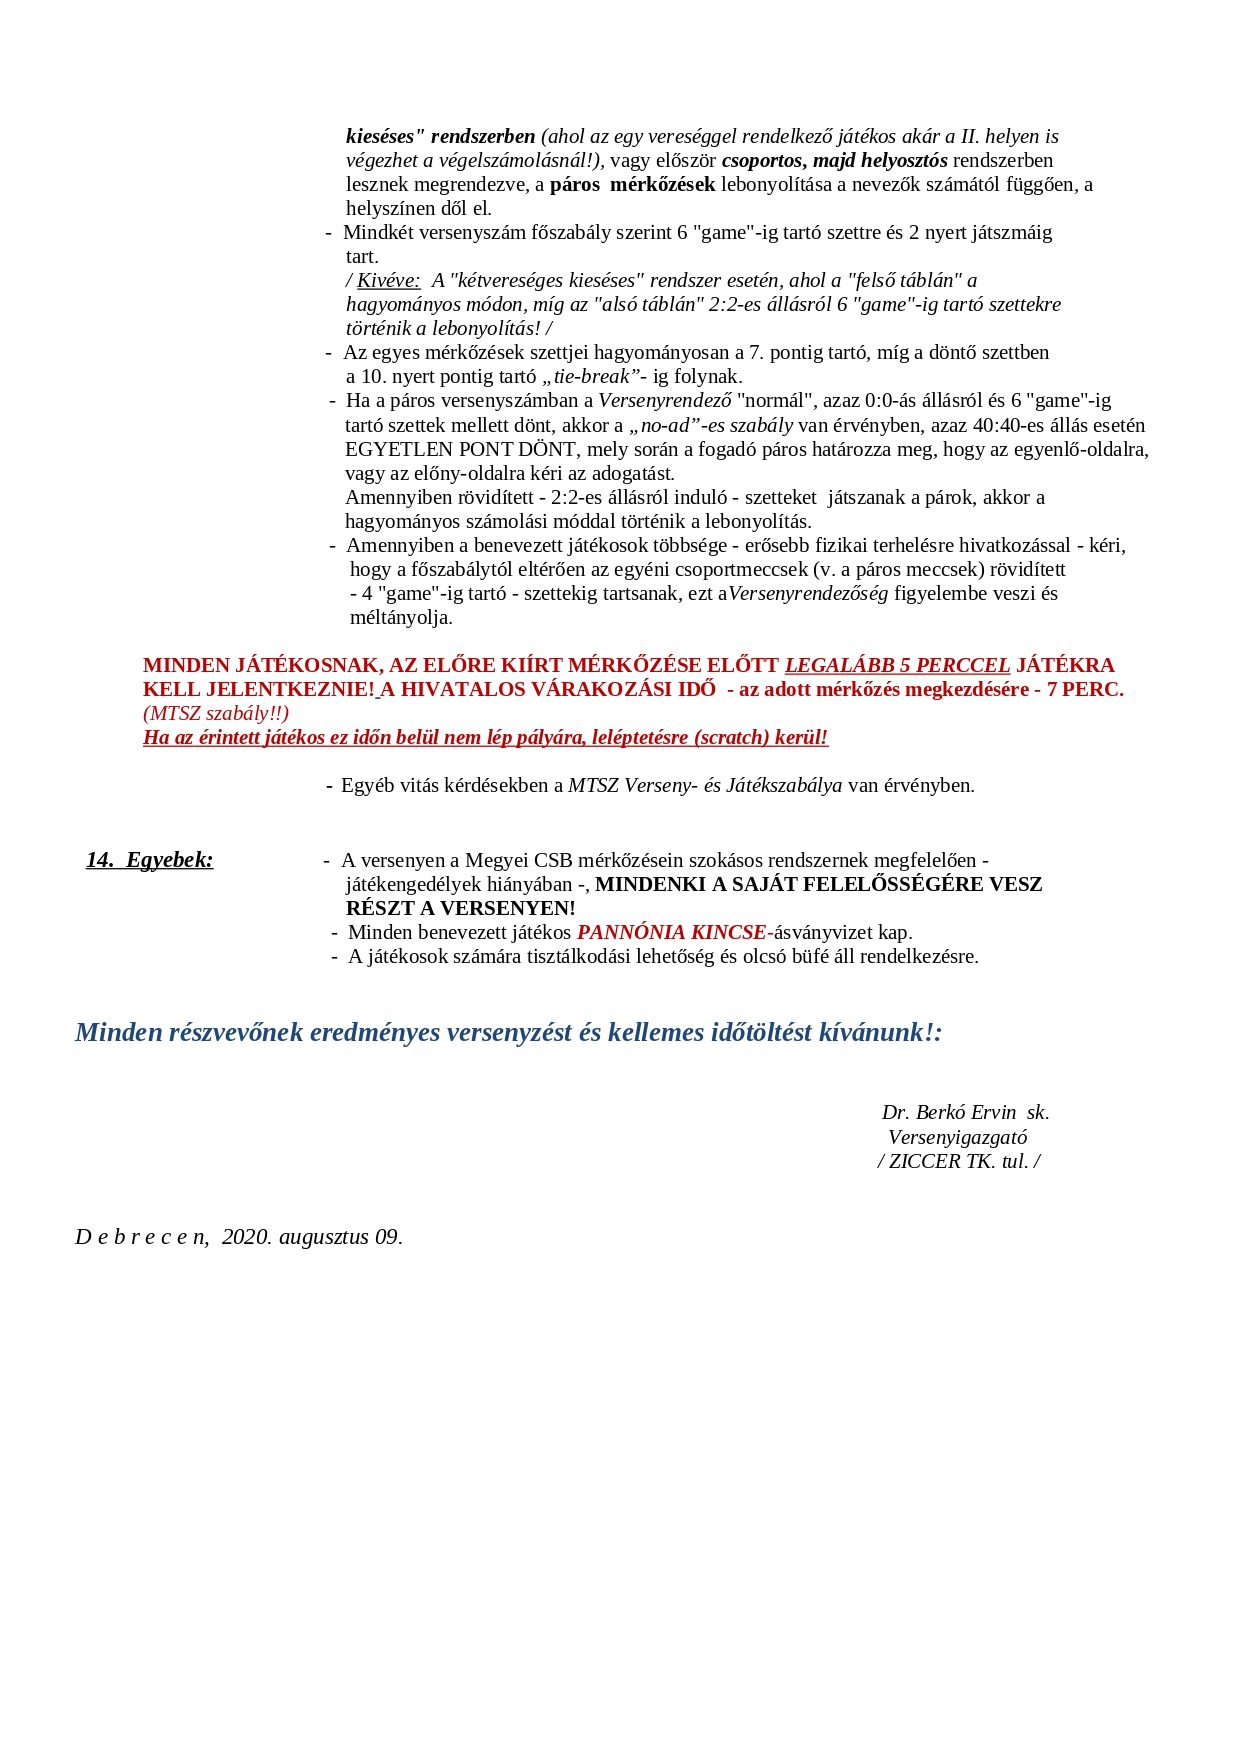 RAD.-ZIC.Kupa-kiírás(X.,2020.08.15.)_page-0002